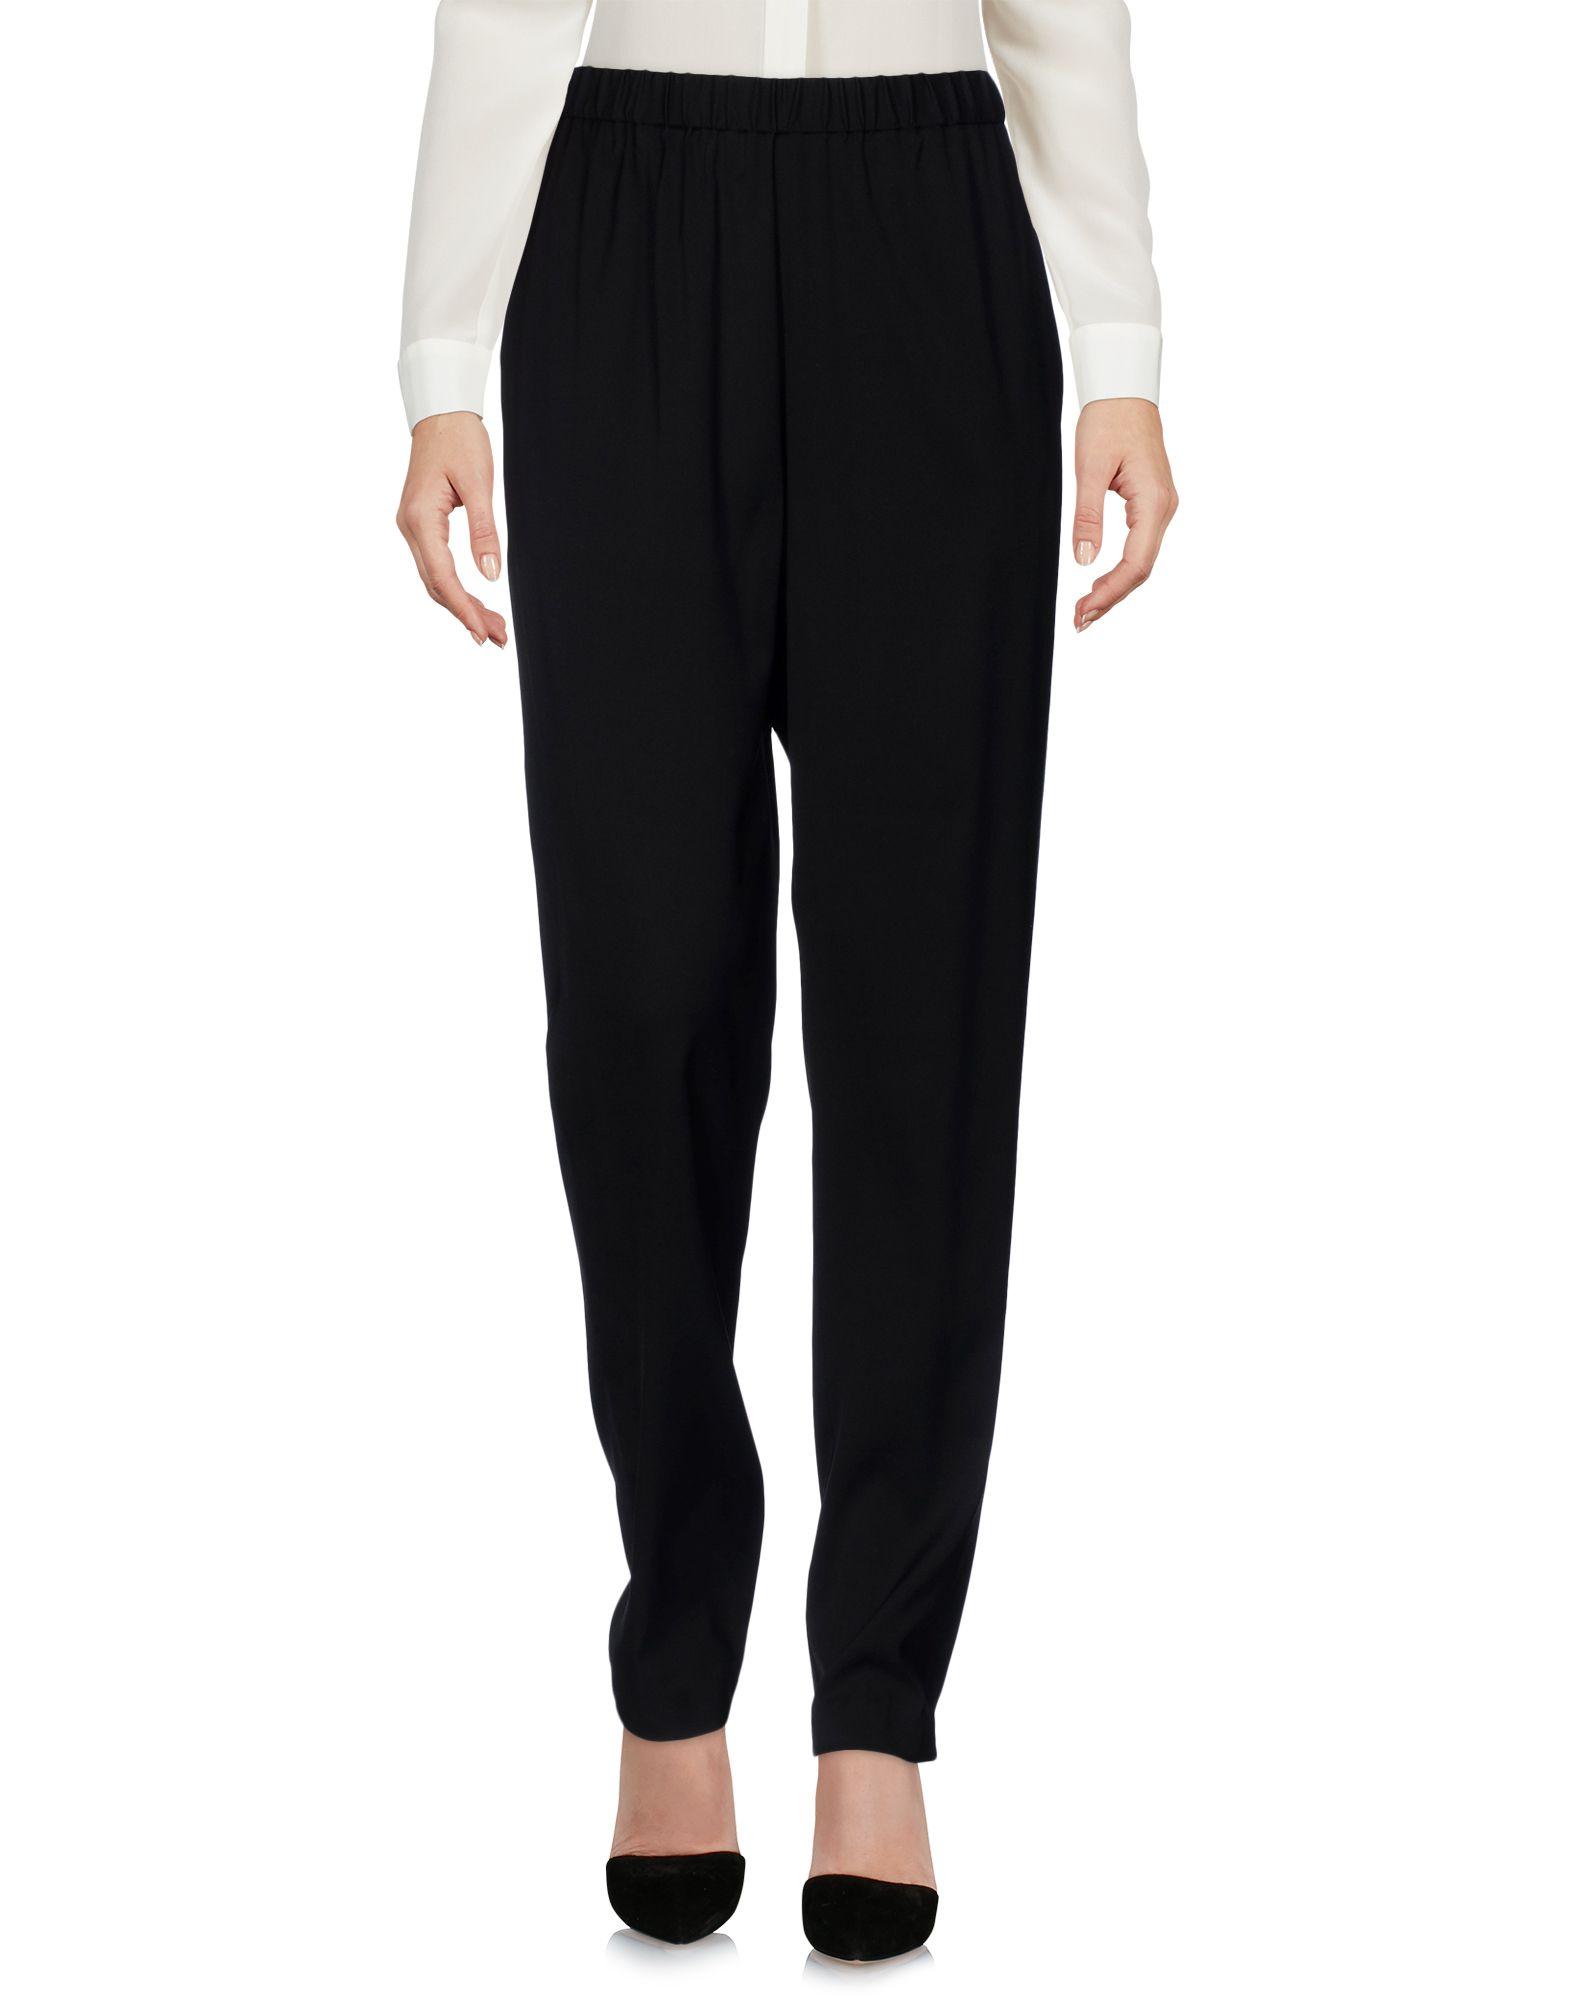 Pantalone T By Alexander Wang Donna - Acquista online su ozVrj